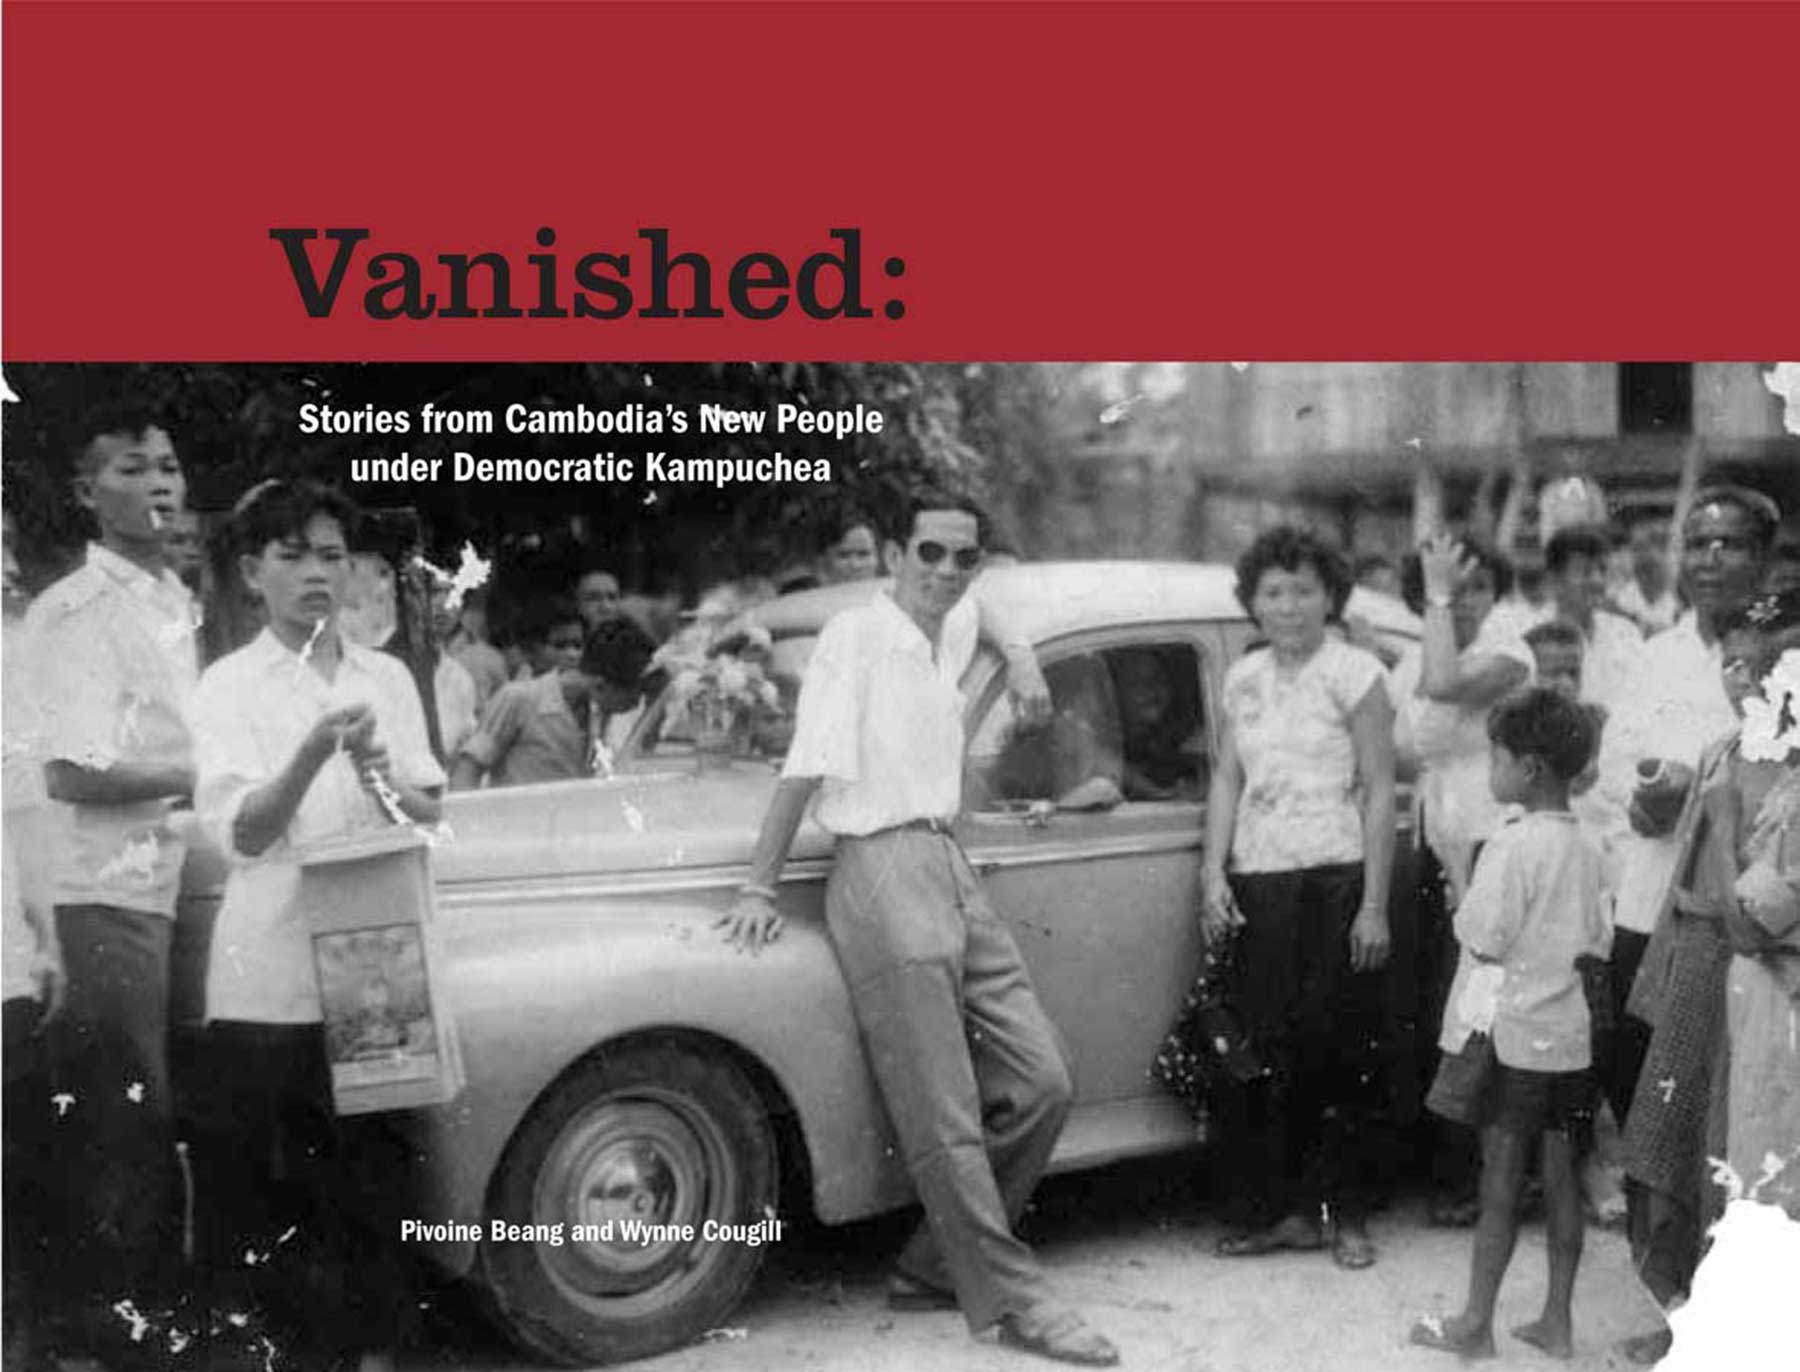 VANISHED (2007)